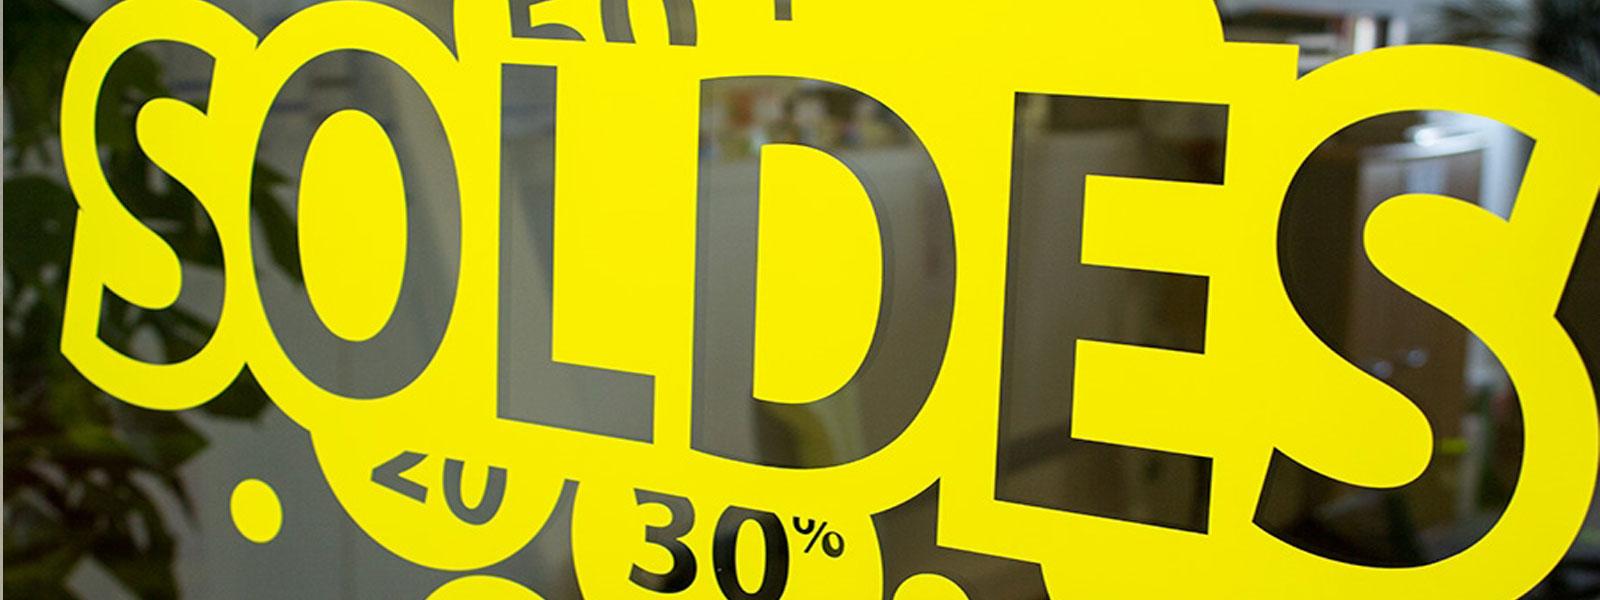 lettrage solde vitrine magasin